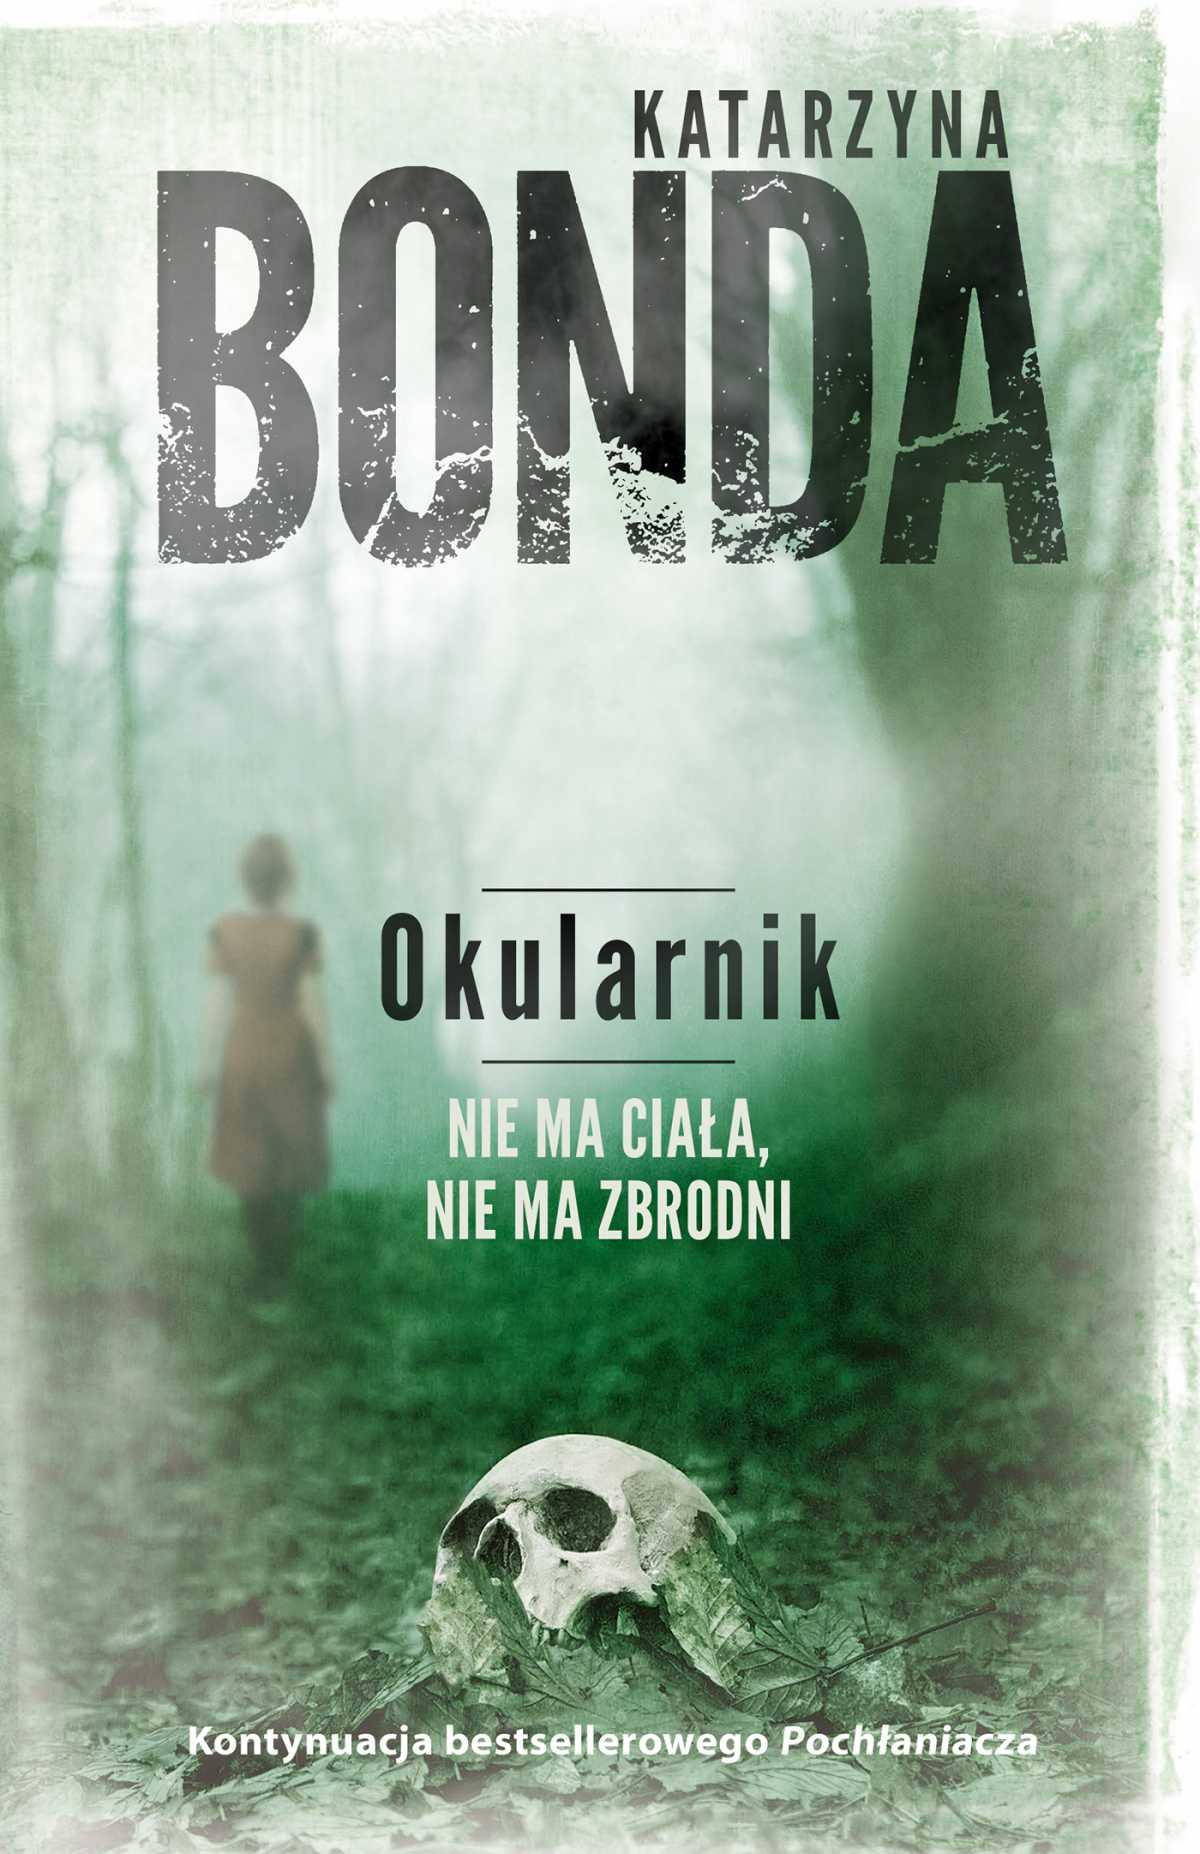 Okularnik - Ebook (Książka na Kindle) do pobrania w formacie MOBI